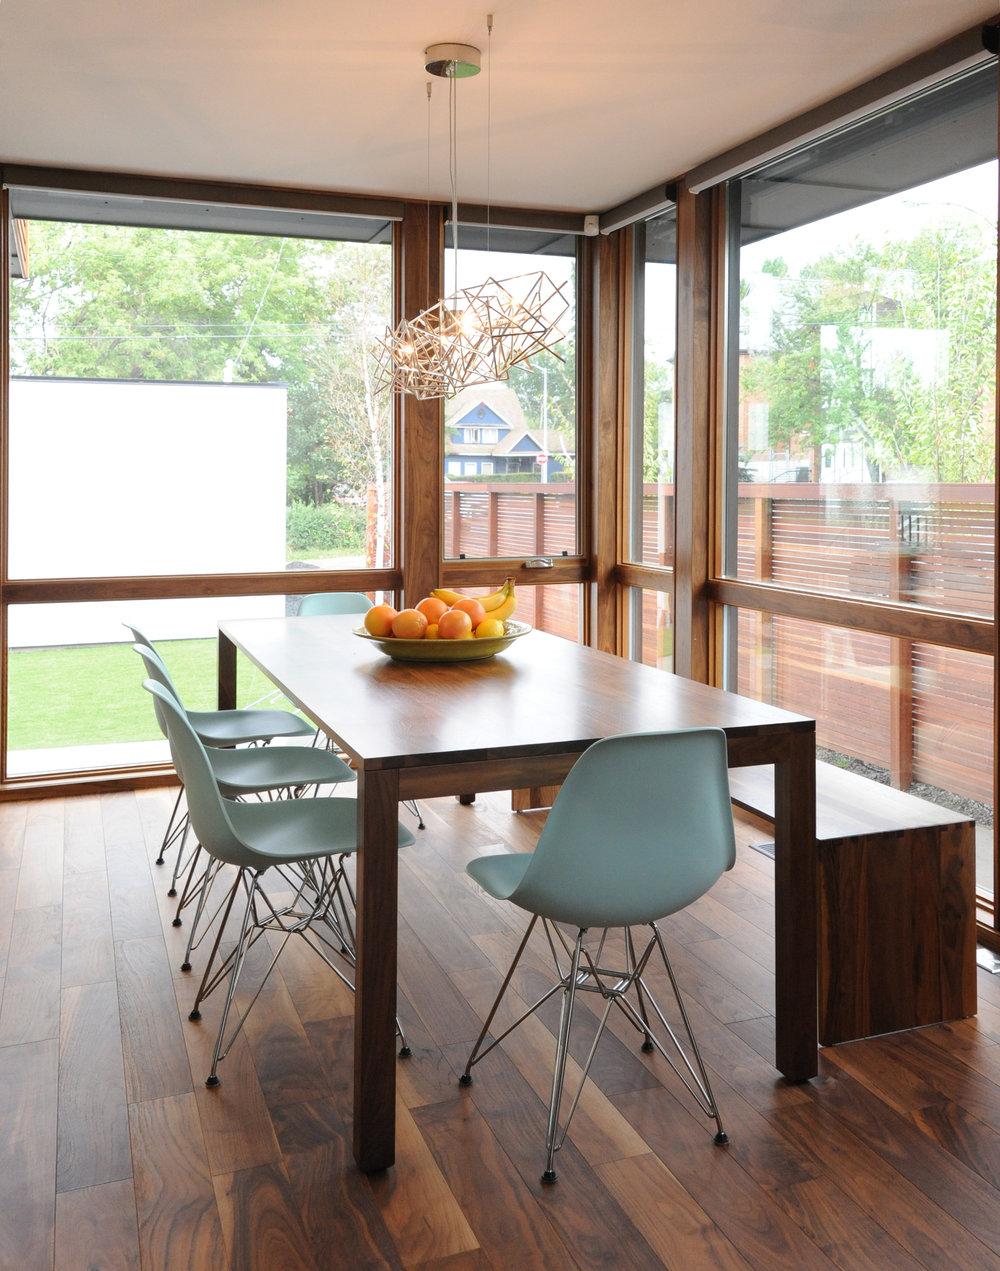 turkel_modern_design_prefab_home_bankview_house_calgary_dining_room.jpg